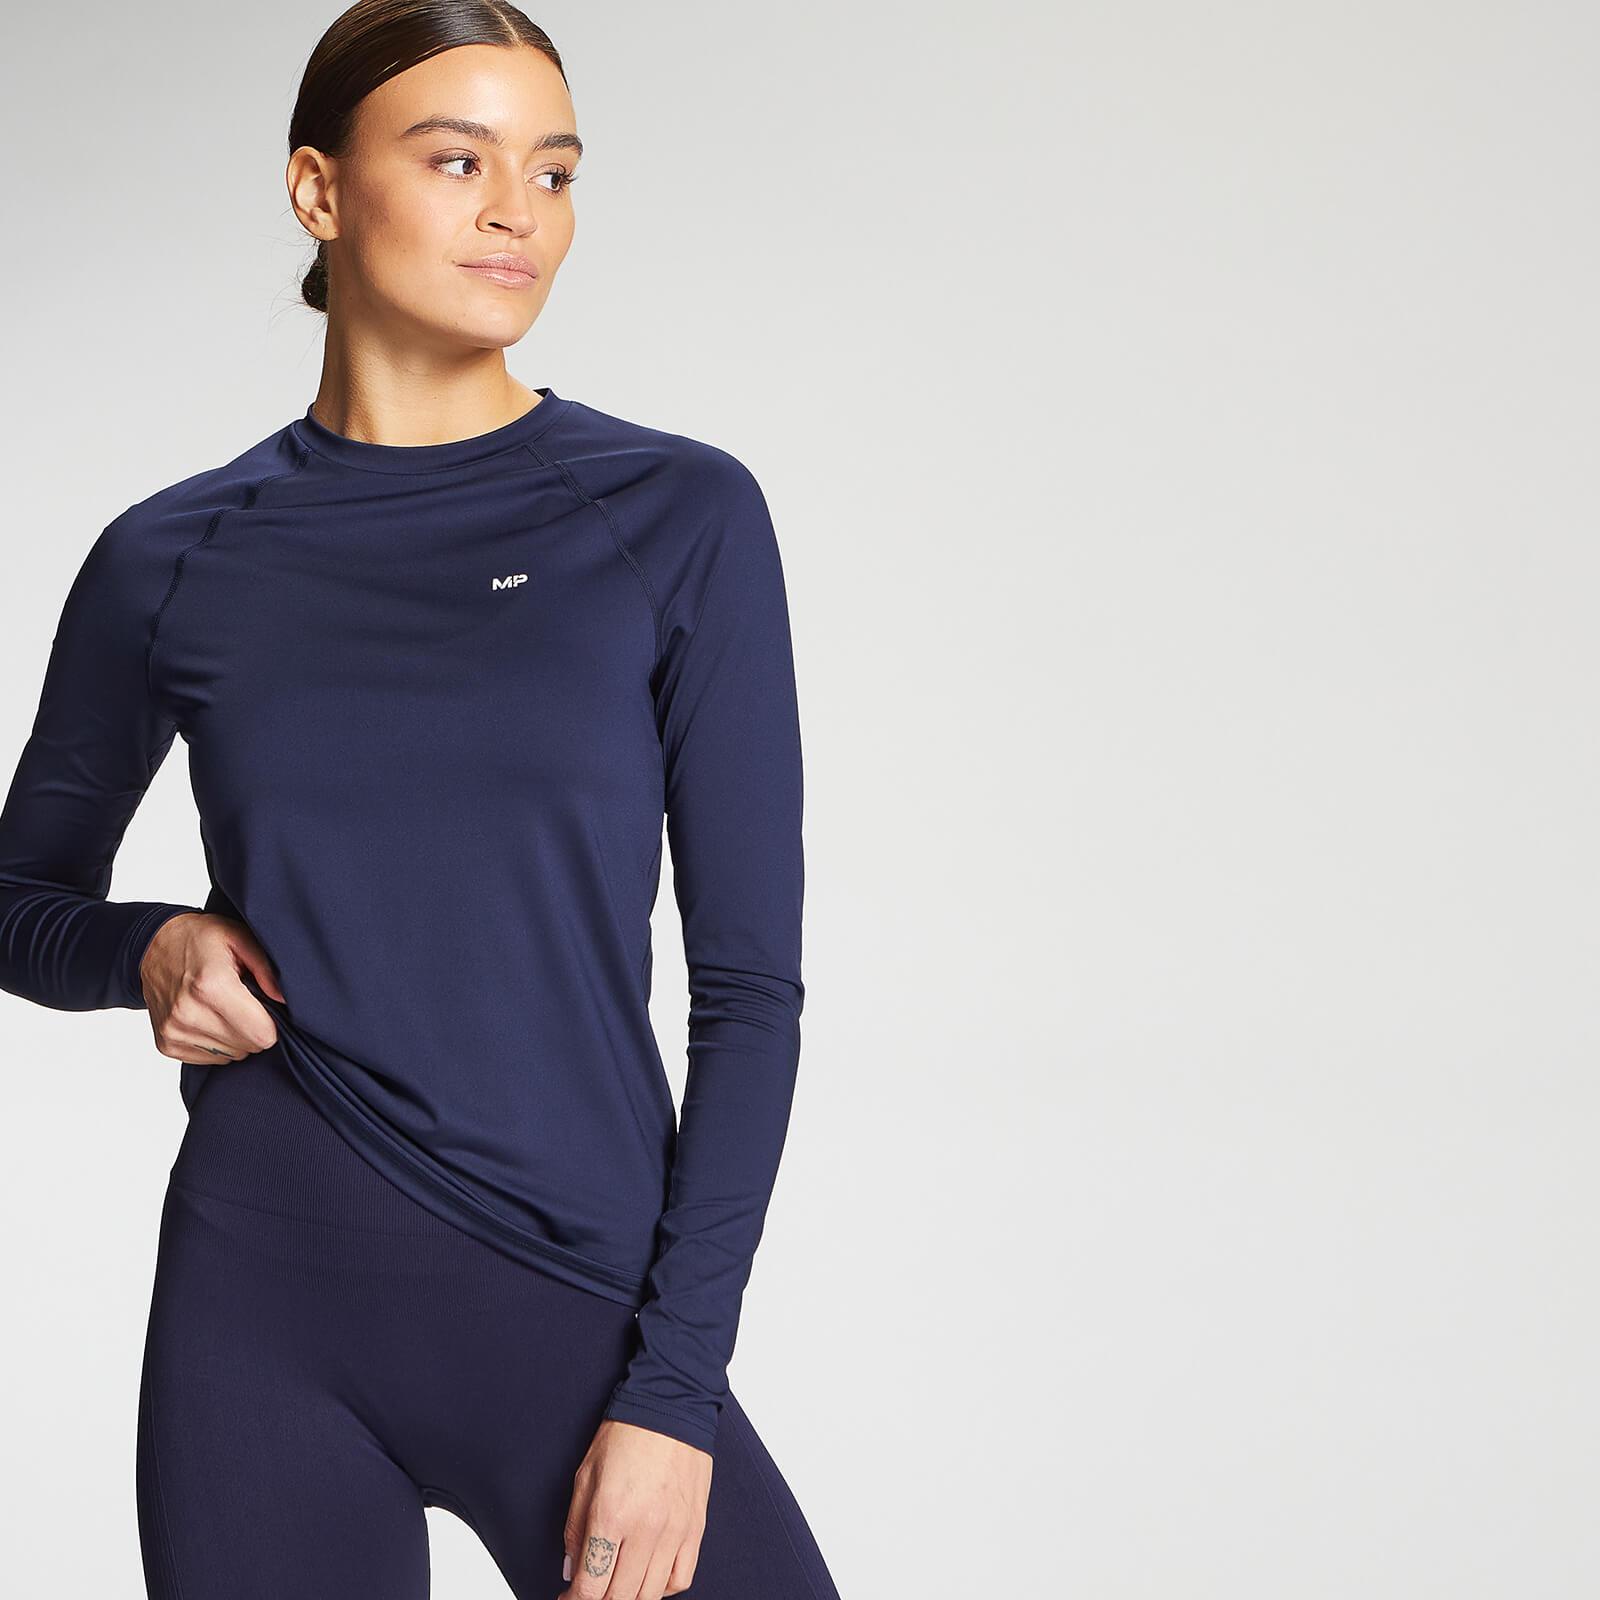 Купить MP Women's Essentials Training Slim Fit Long Sleeve Top - Navy - XS, Myprotein International